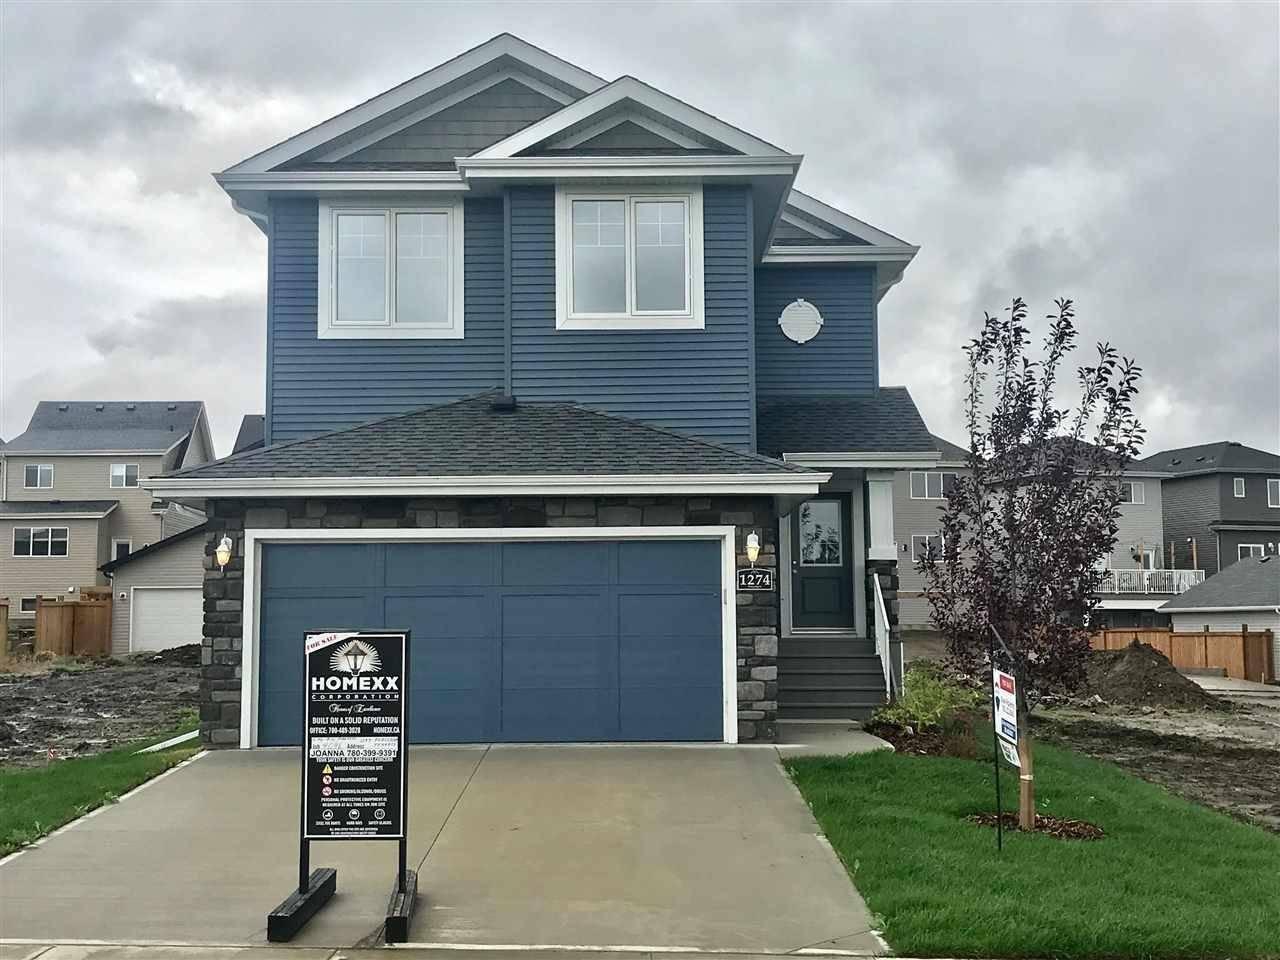 House for sale at 1274 Peregrine Te Nw Edmonton Alberta - MLS: E4169587